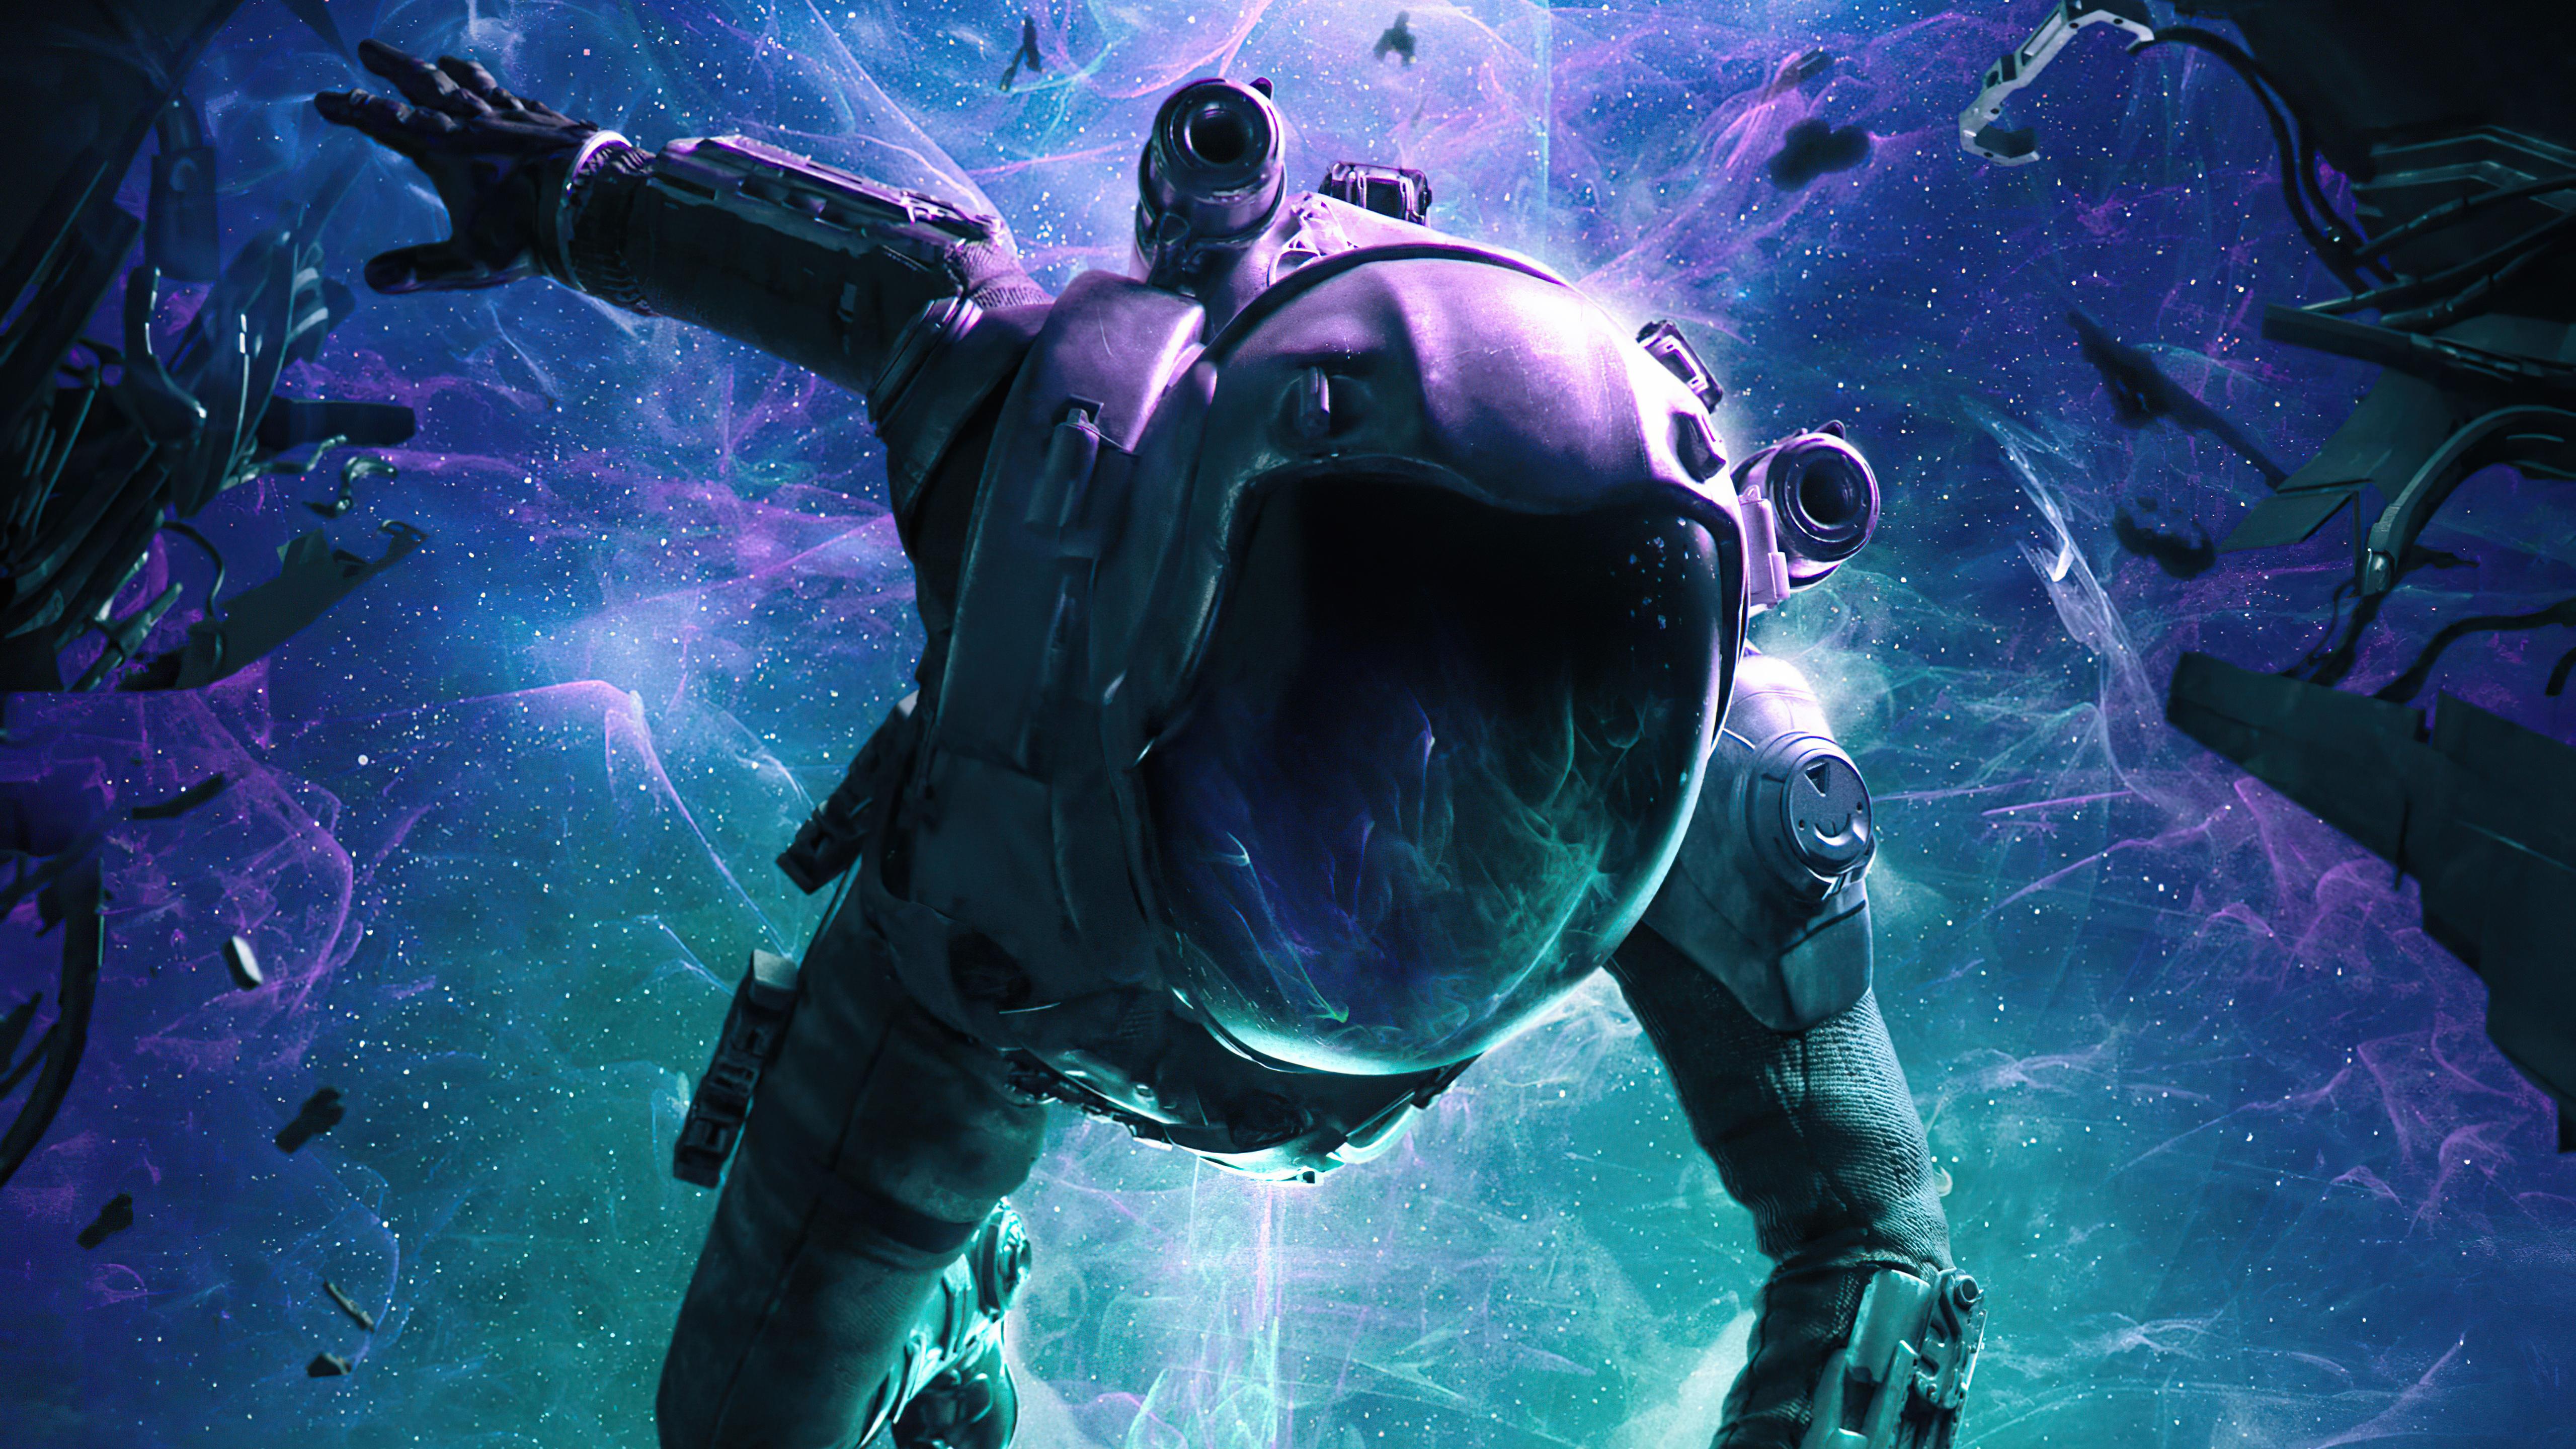 scifi space aurora life 4k 1618130550 - Scifi Space Aurora Life 4k - Scifi Space Aurora Life 4k wallpapers